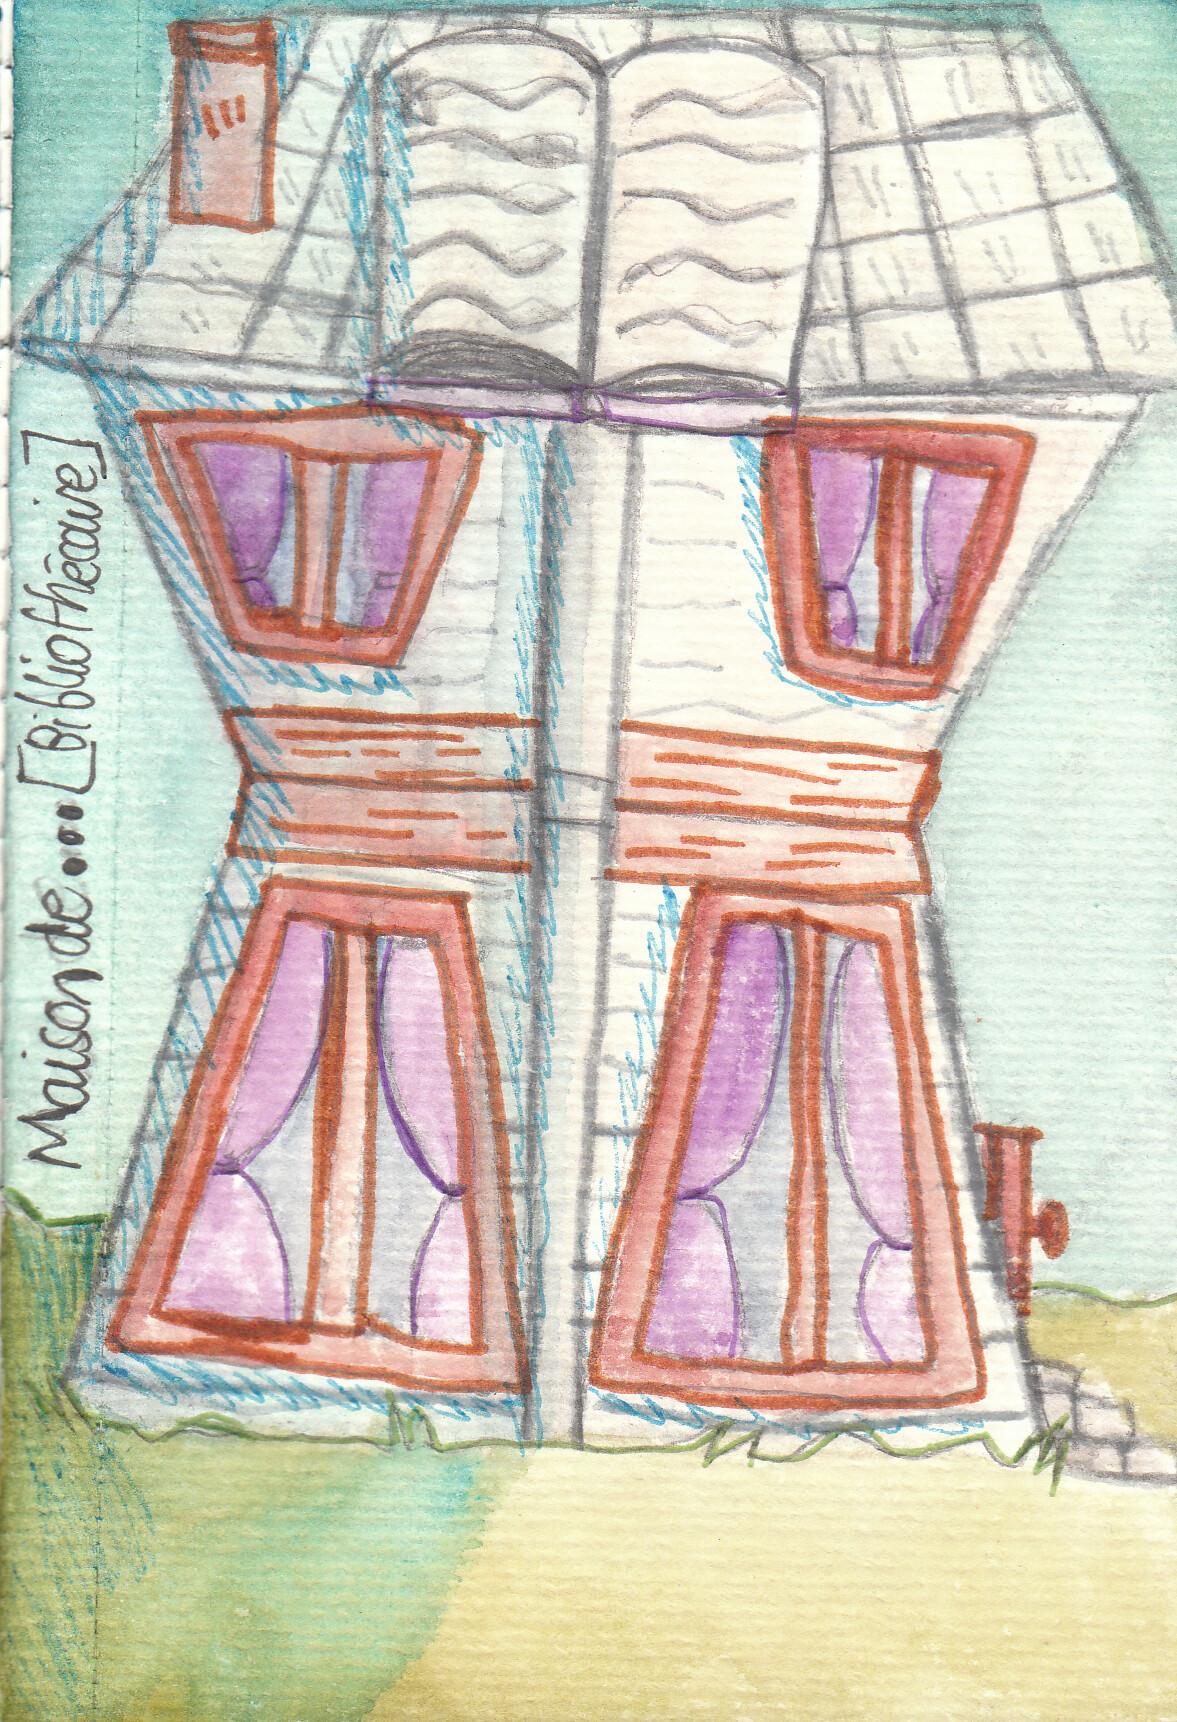 Anei ragdowl cd maison de bibliothecaire